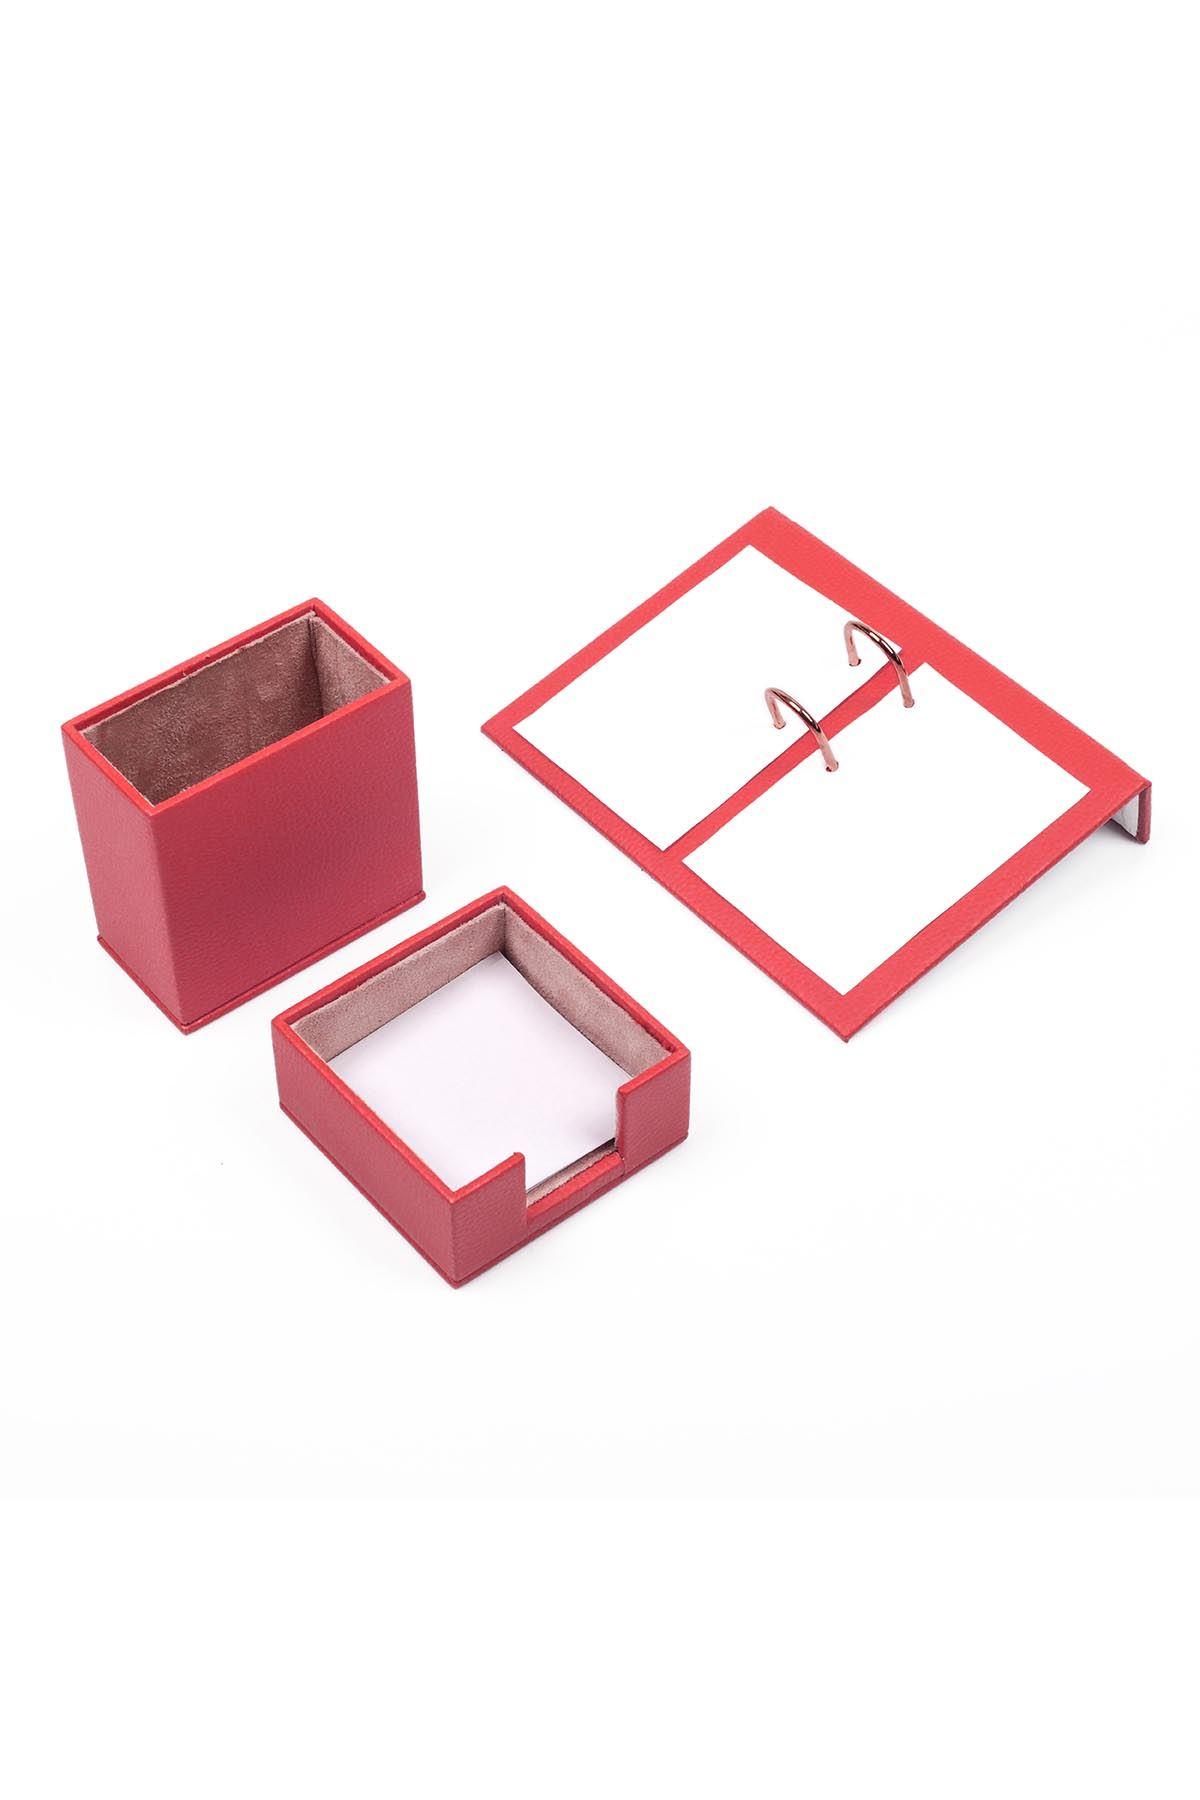 Leather Desk Accessories set of 3 Orange| Desk Set Accessories | Desktop Accessories | Desk Accessories | Desk Organizers